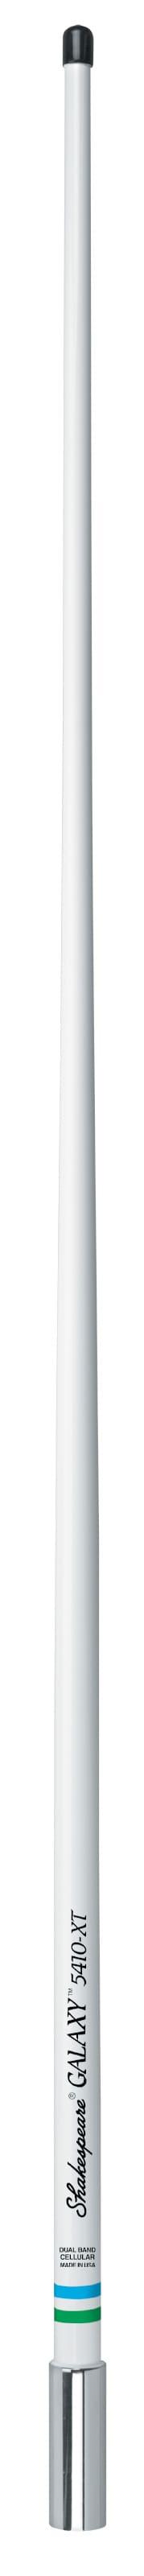 5410XT - Shakespeare 4' 3DB 800/900Mhz/1900Mhz Cellular Marine Antenna